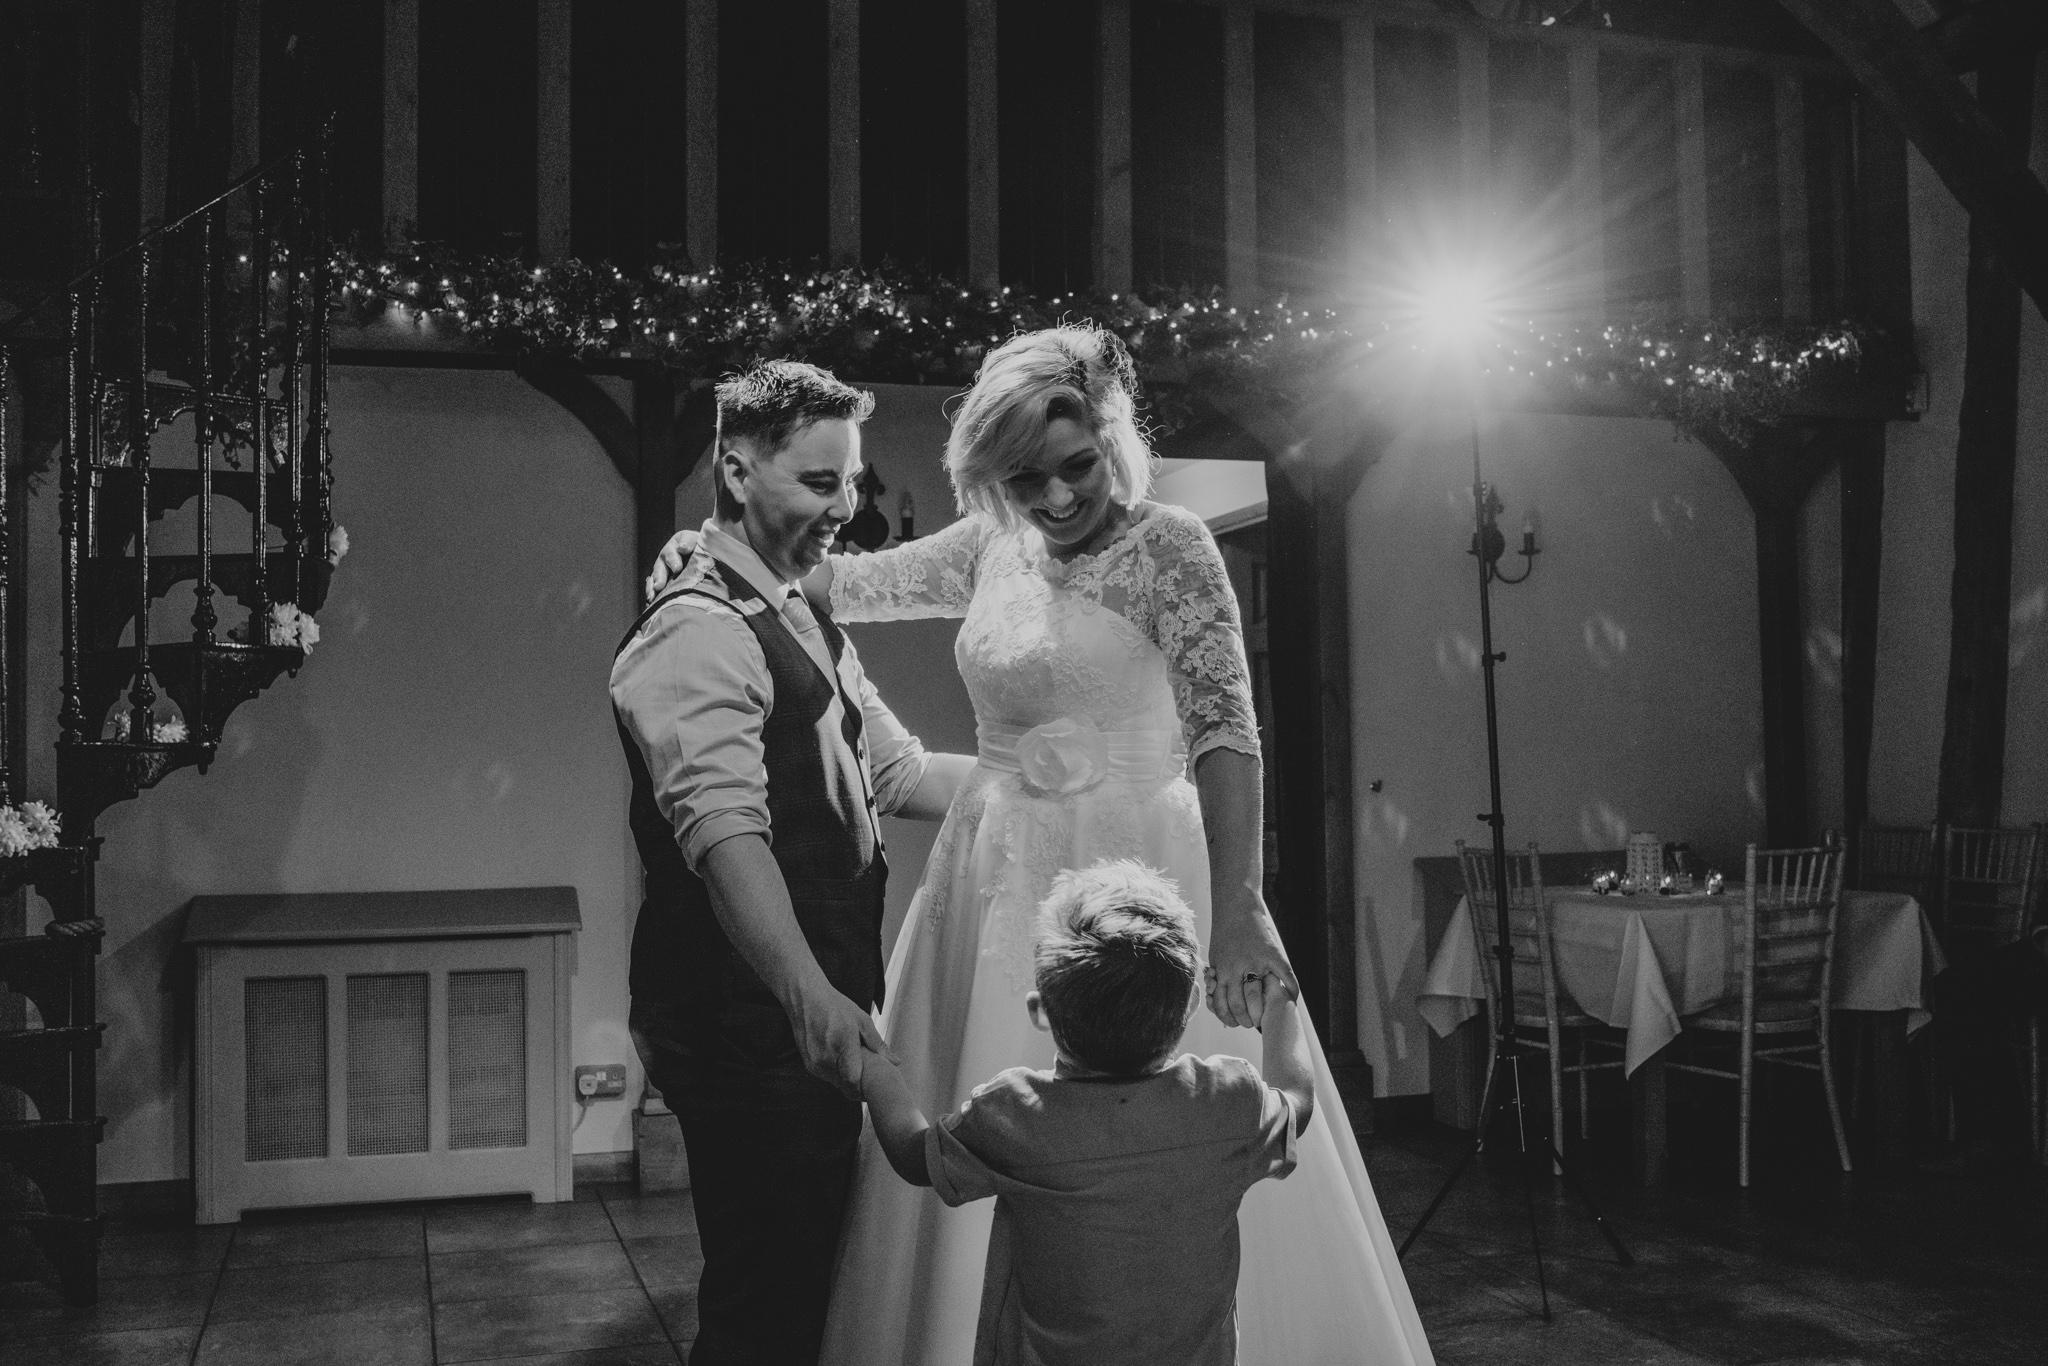 rhia-james-rustic-crabbs-barn-vintage-50s-retro-wedding-grace-elizabeth-colchester-essex-alternative-relaxed-wedding-family-photography-devon-suffolk-norfolk-essex (132 of 138).jpg